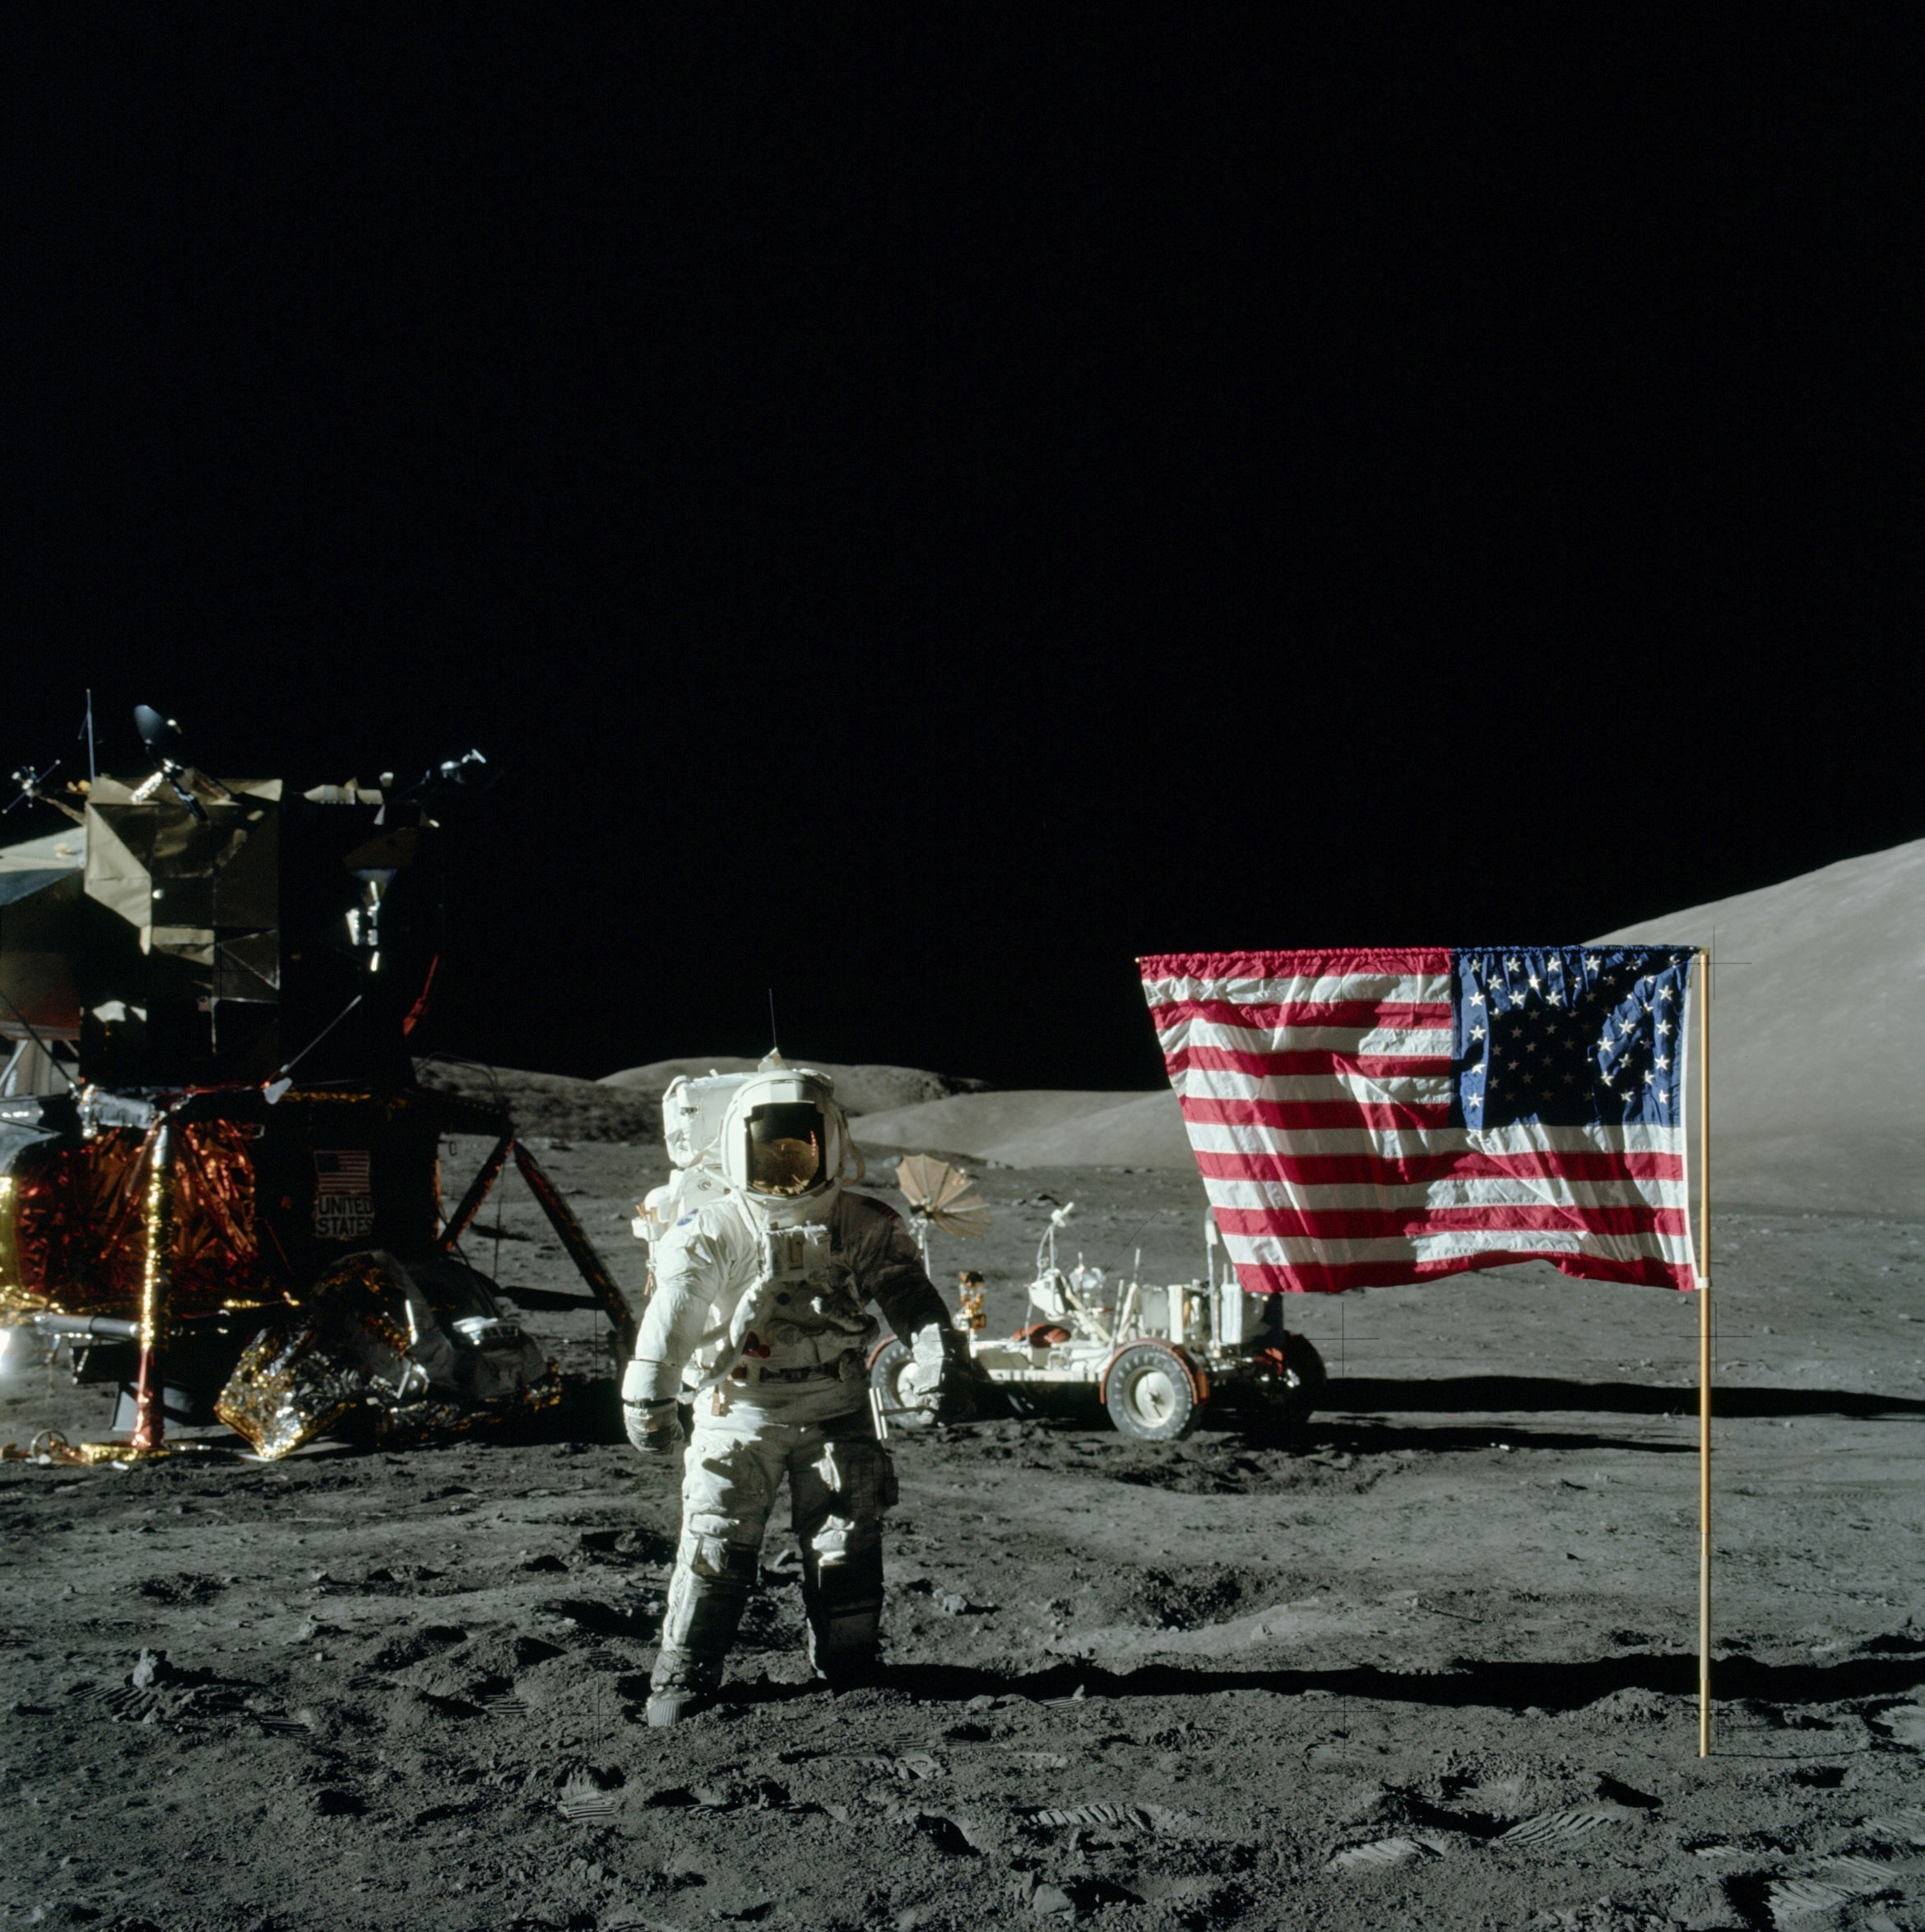 Moonwalker Jack Schmitt and the Future of US Space Exploration (Exclusive Interview)